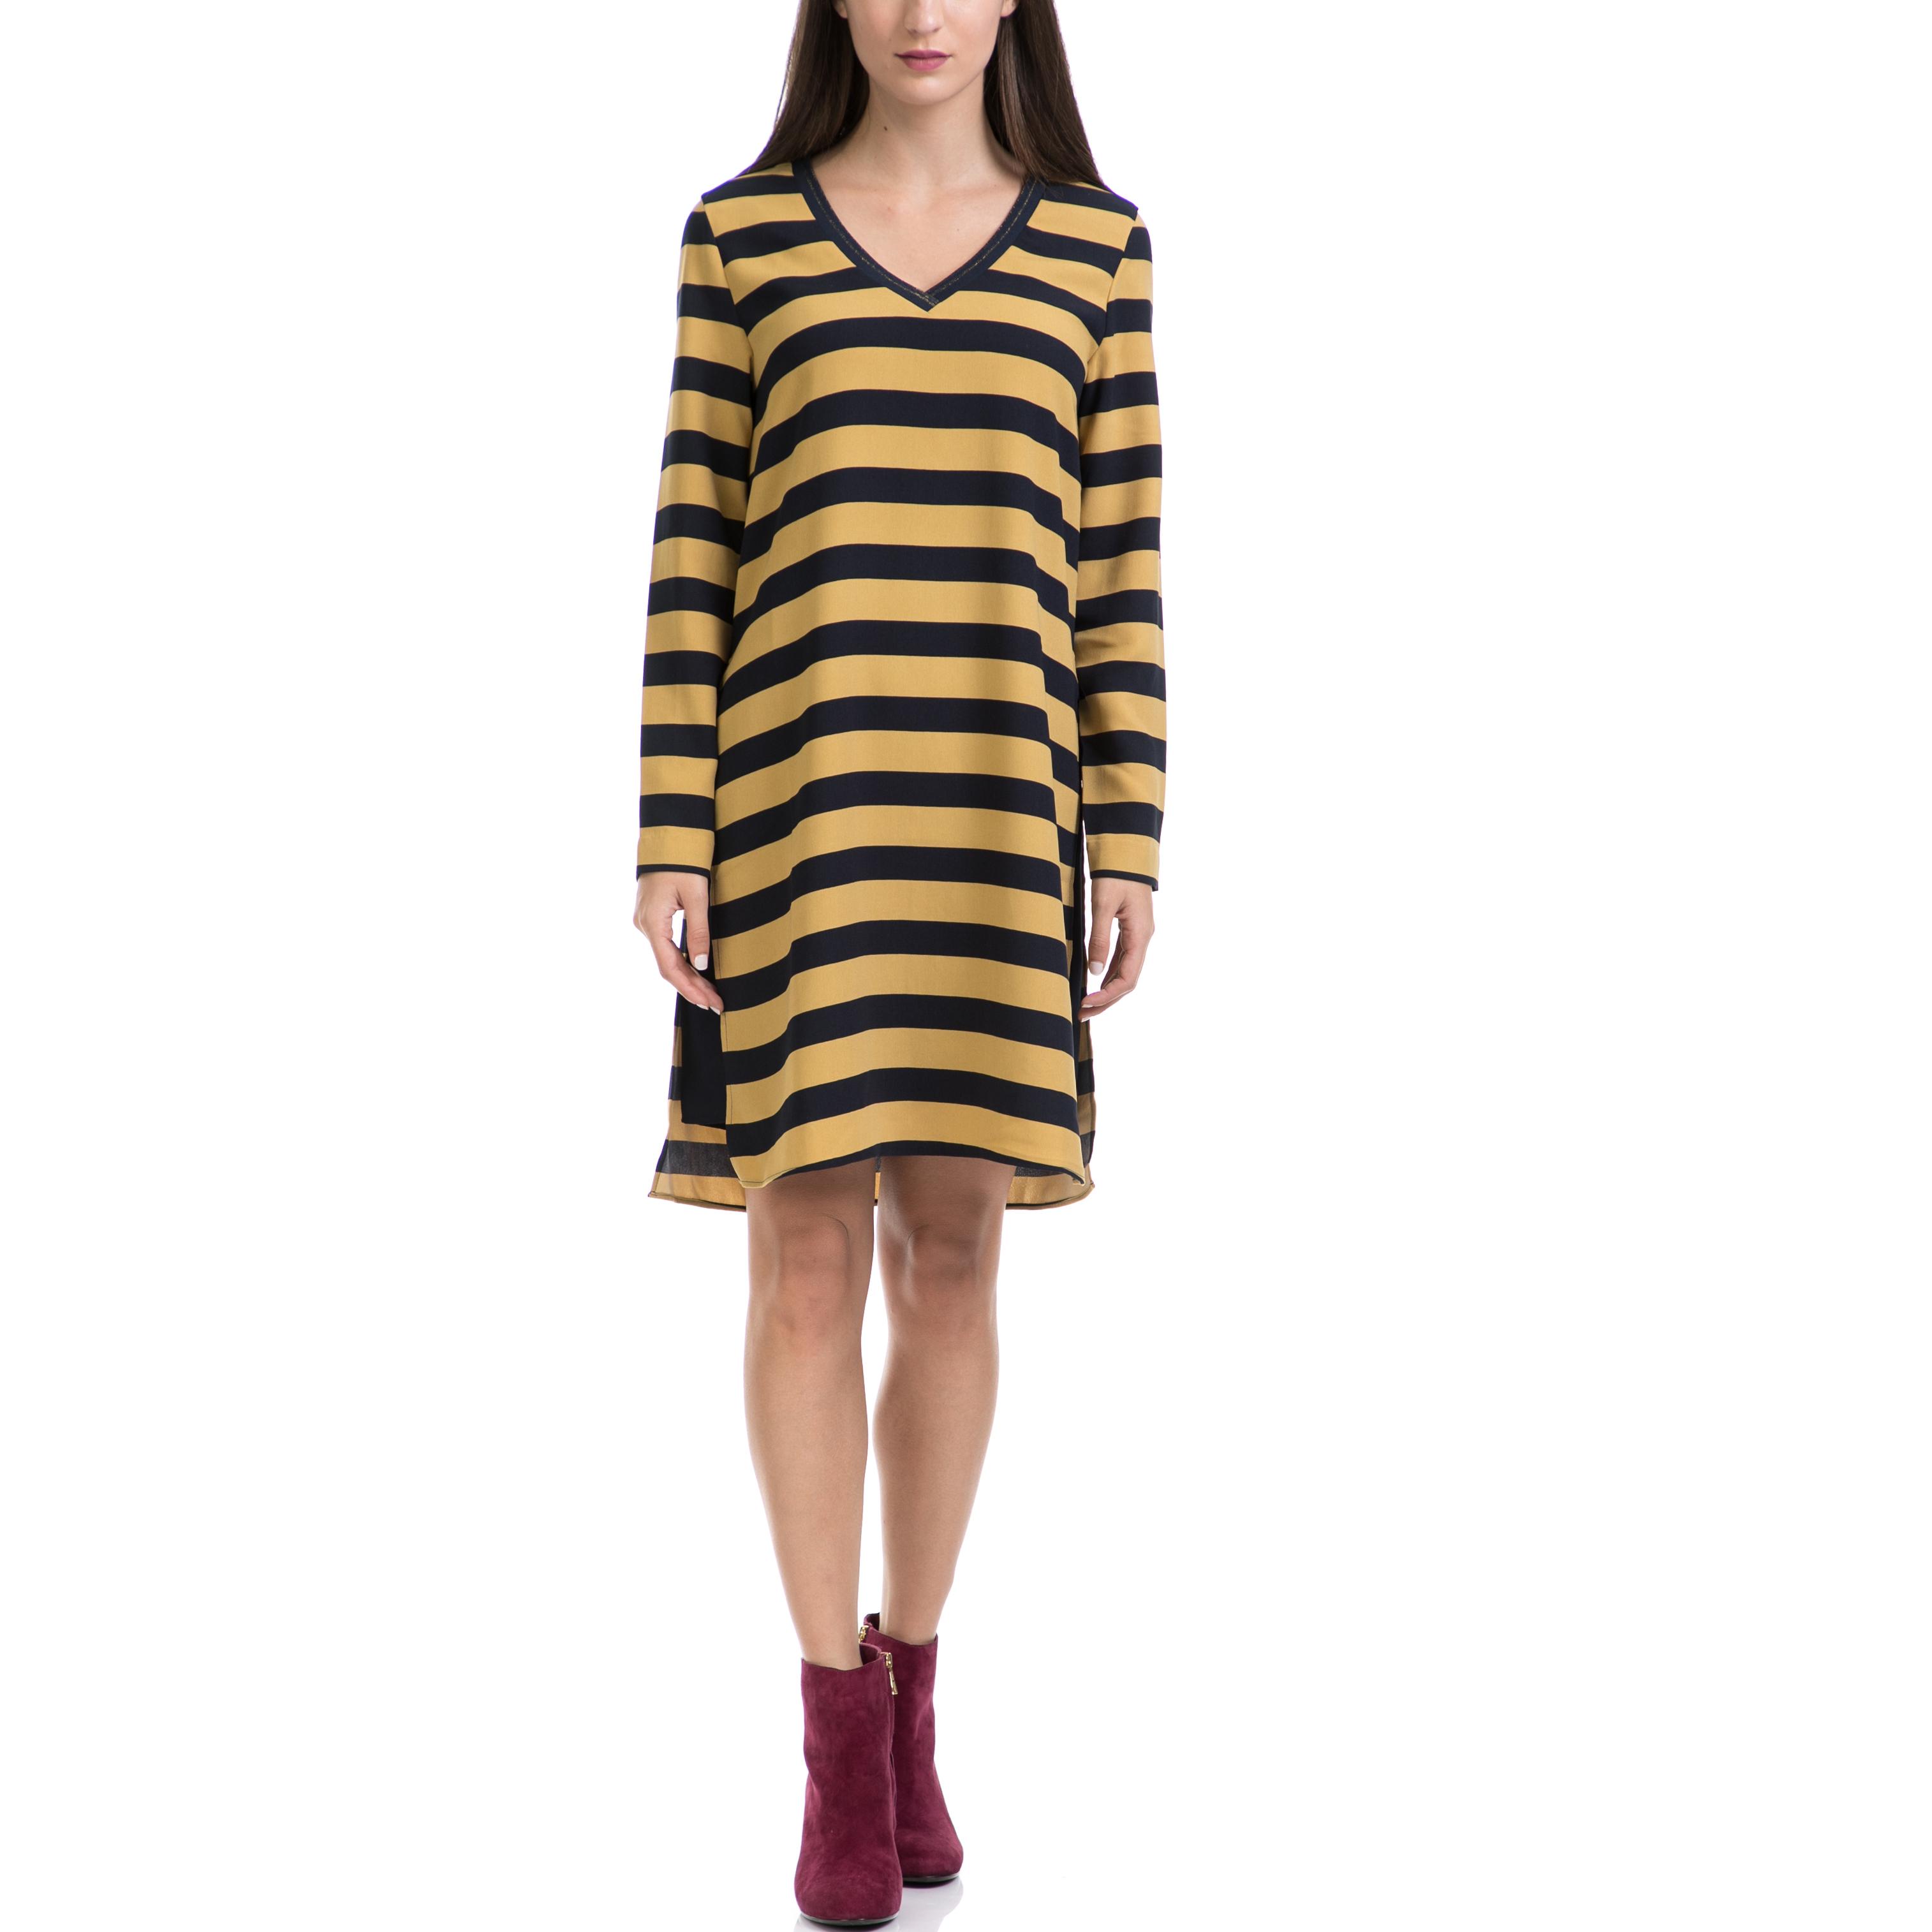 SCOTCH & SODA - Γυναικείο φόρεμα MAISON SCOTCH μαύρο-κίτρινο γυναικεία ρούχα φορέματα μέχρι το γόνατο